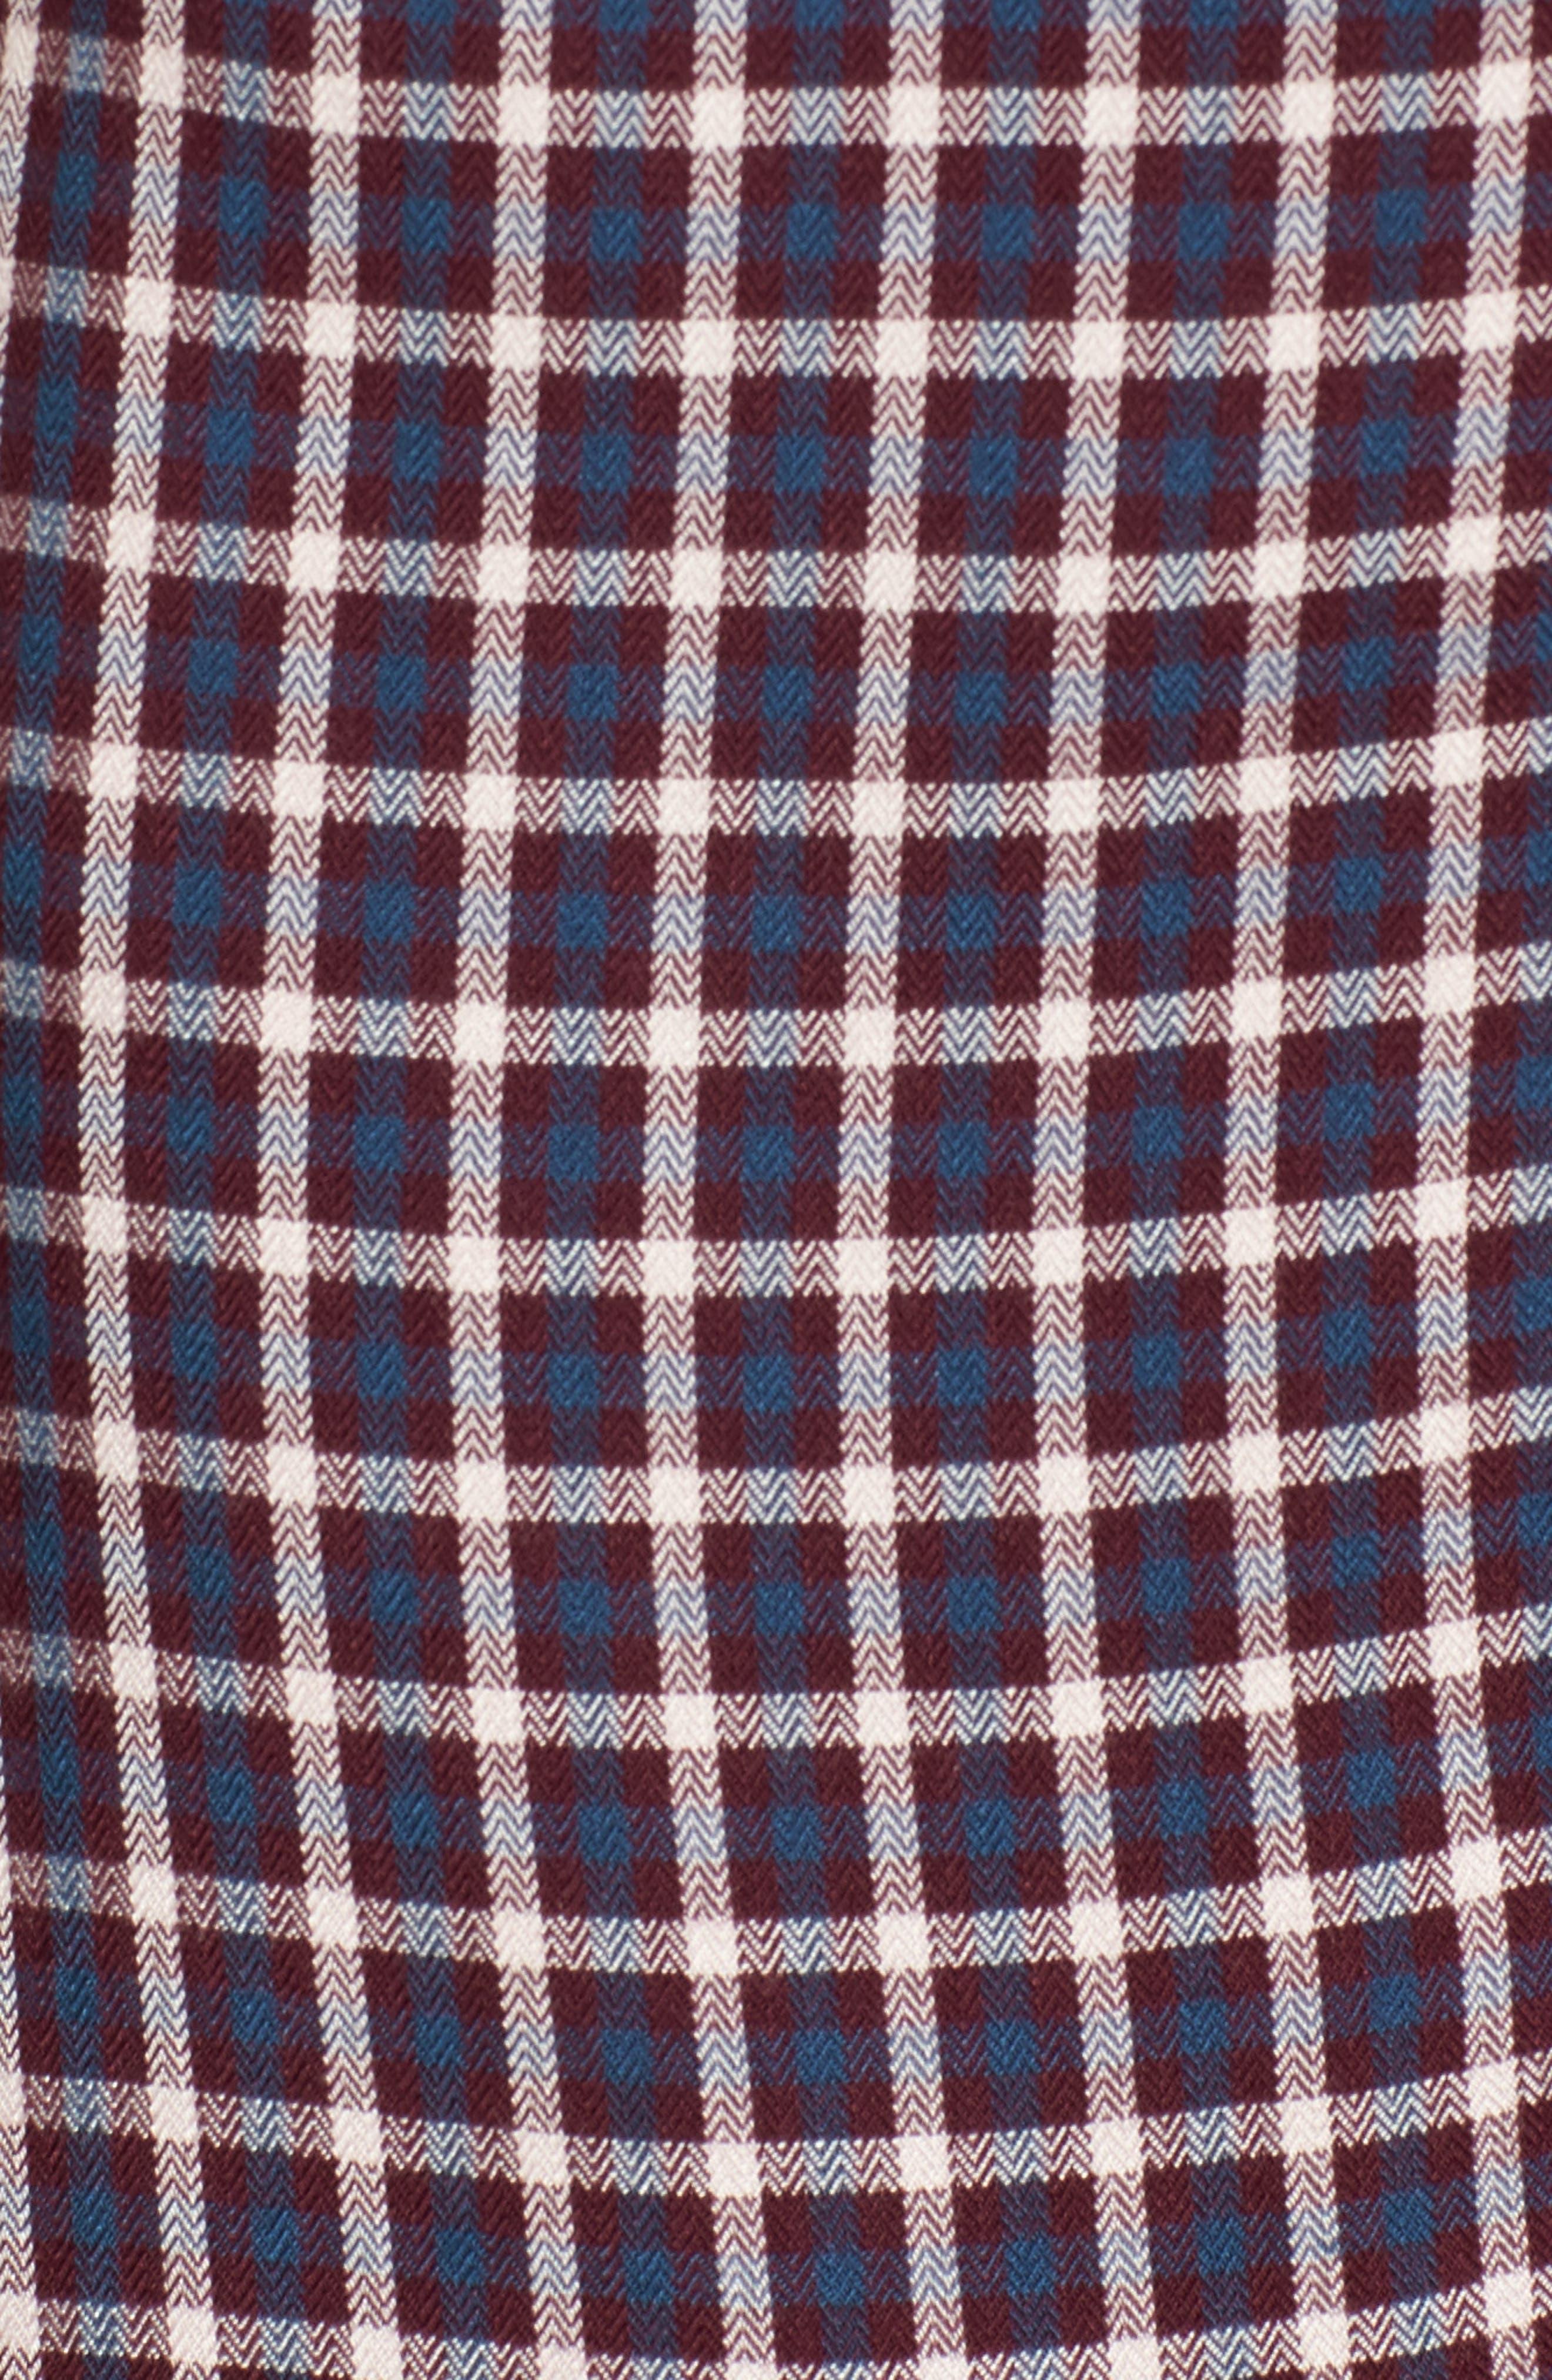 Plaid Shirtdress,                             Alternate thumbnail 5, color,                             Burgundy Fig Hound Gingham